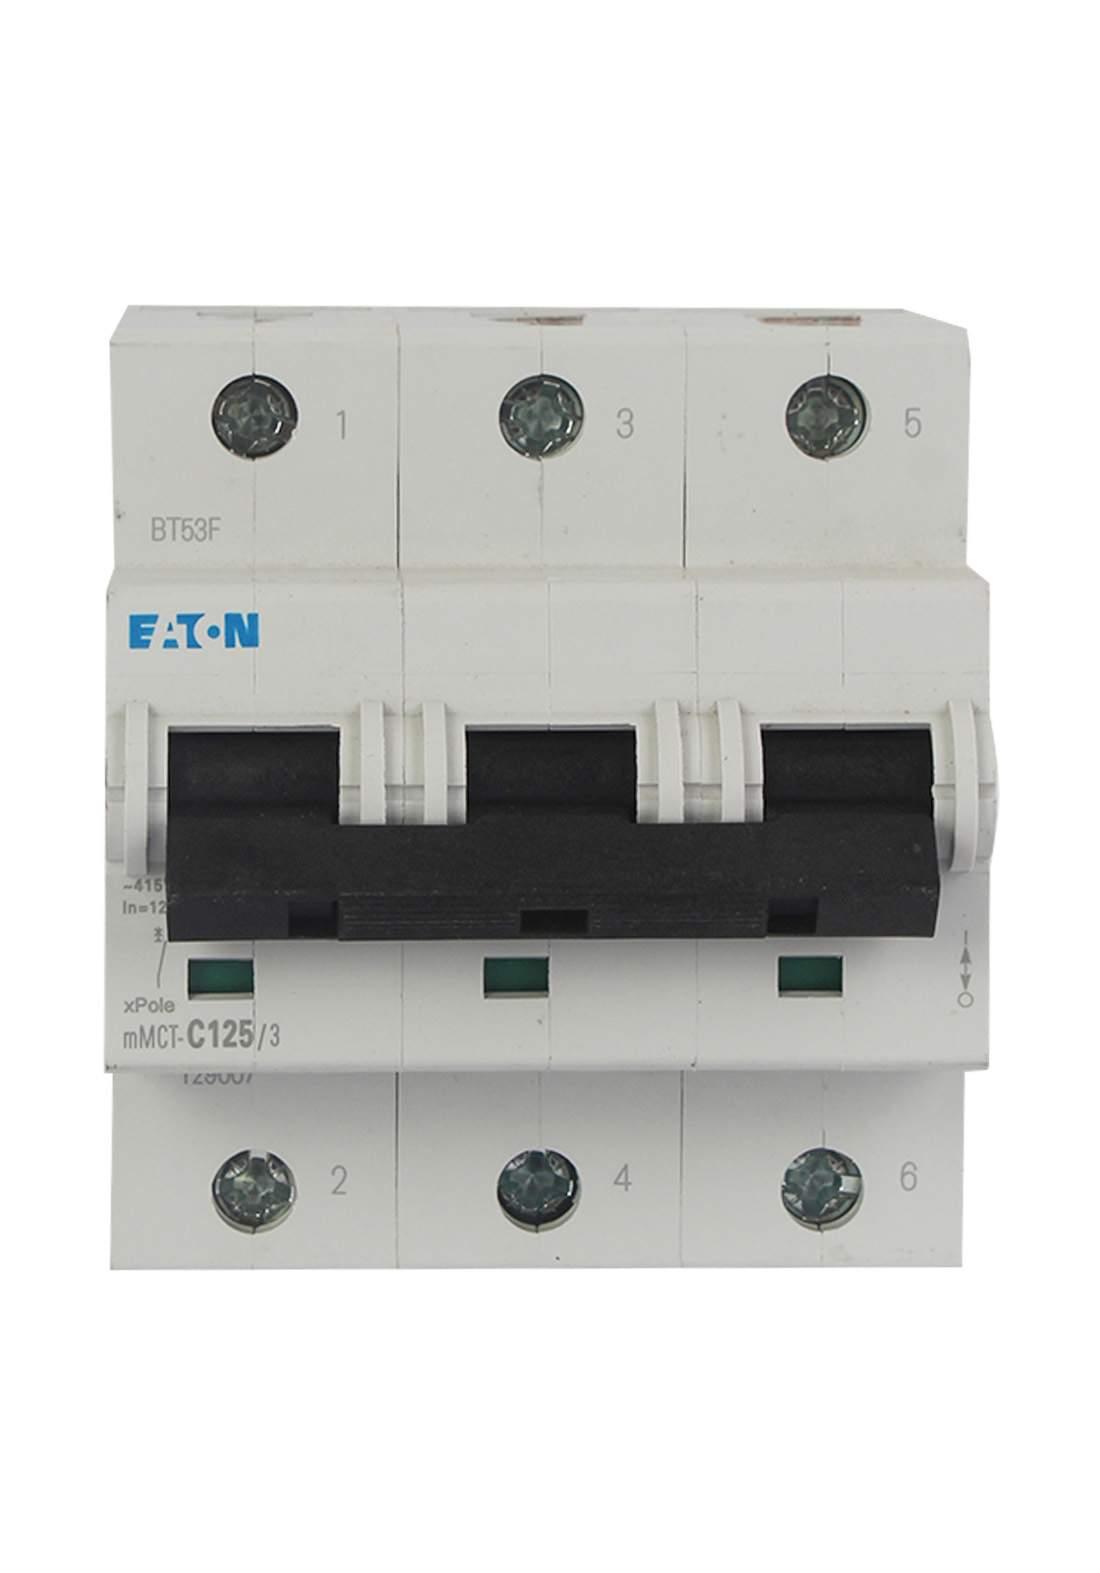 Eaton MCT - C125/3 Circuit Breaker 125A قاطع تيار الكهرباء ثلاثي (جوزة)